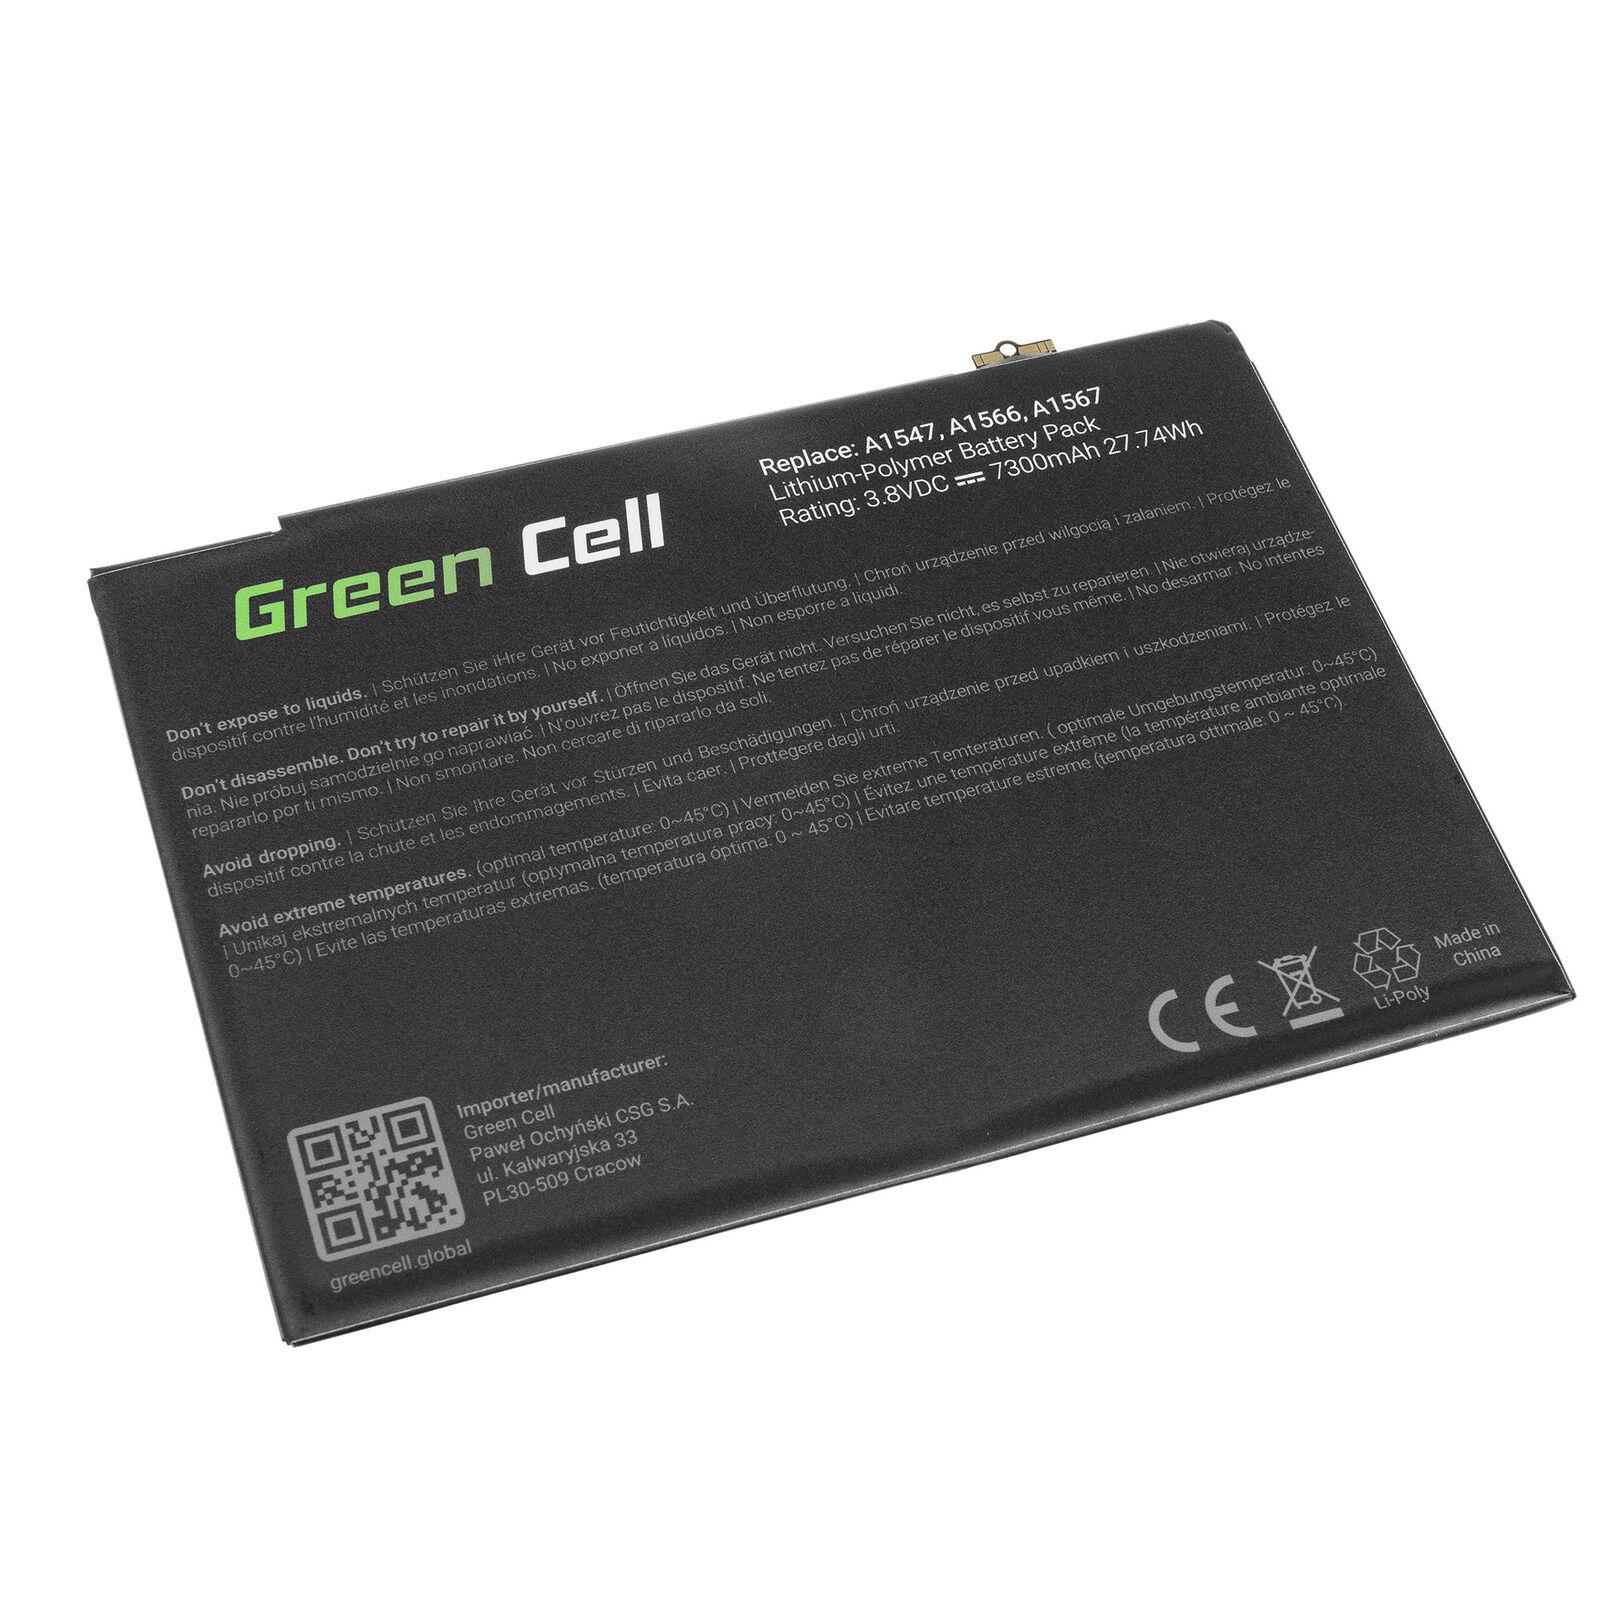 Apple iPad Air 2 7300mAh compatible battery